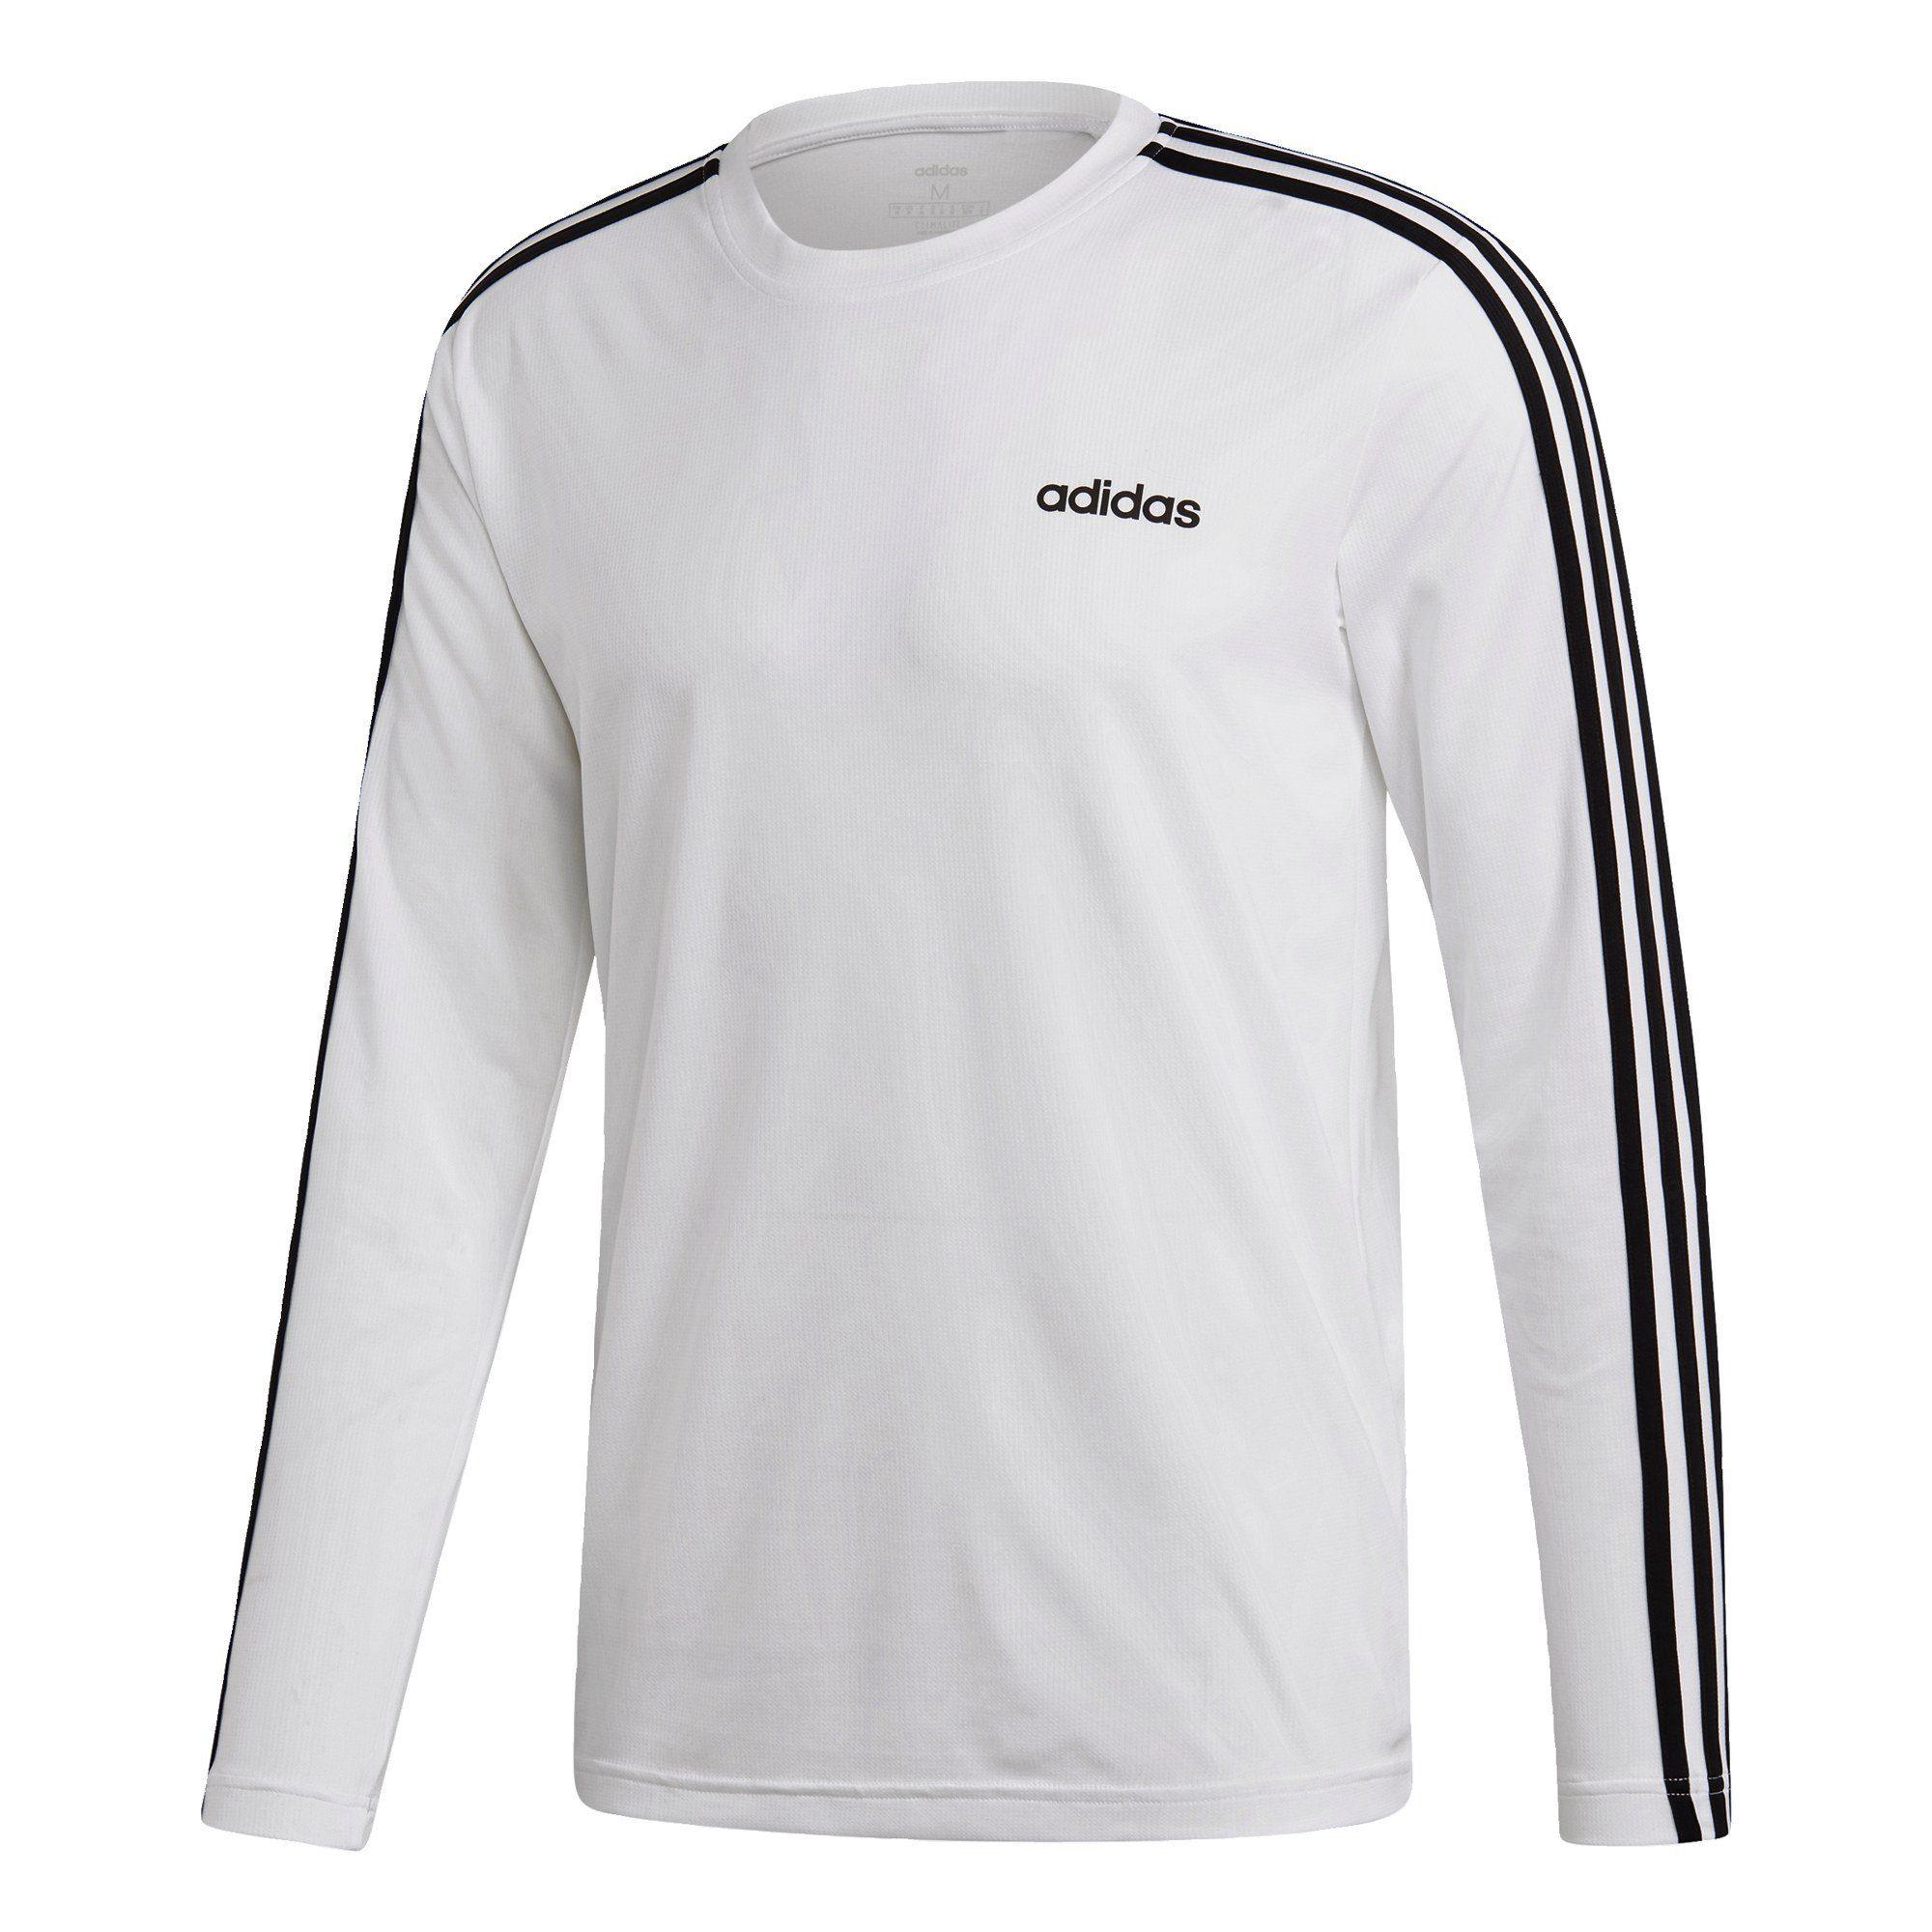 adidas Performance Langarmshirt »Designed 2 Move Climalite 3 Streifen Longsleeve« RDY;Clima online kaufen | OTTO